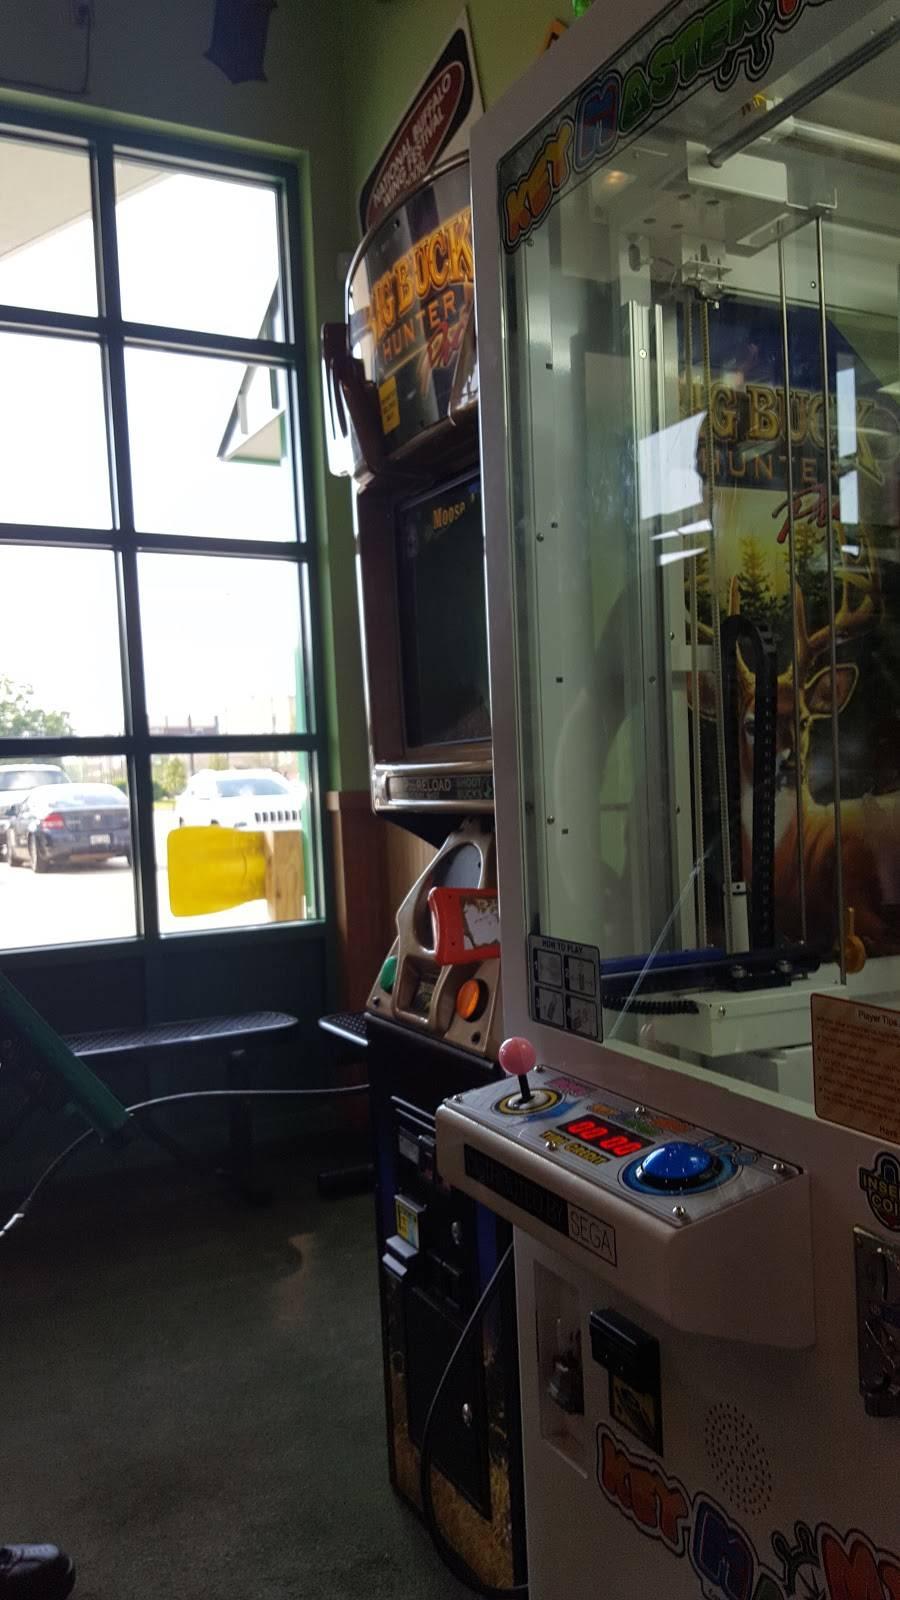 Quaker Steak & Lube   restaurant   2706 S, Cabelas Pkwy Ste. 100, Gonzales, LA 70737, USA   2256479464 OR +1 225-647-9464